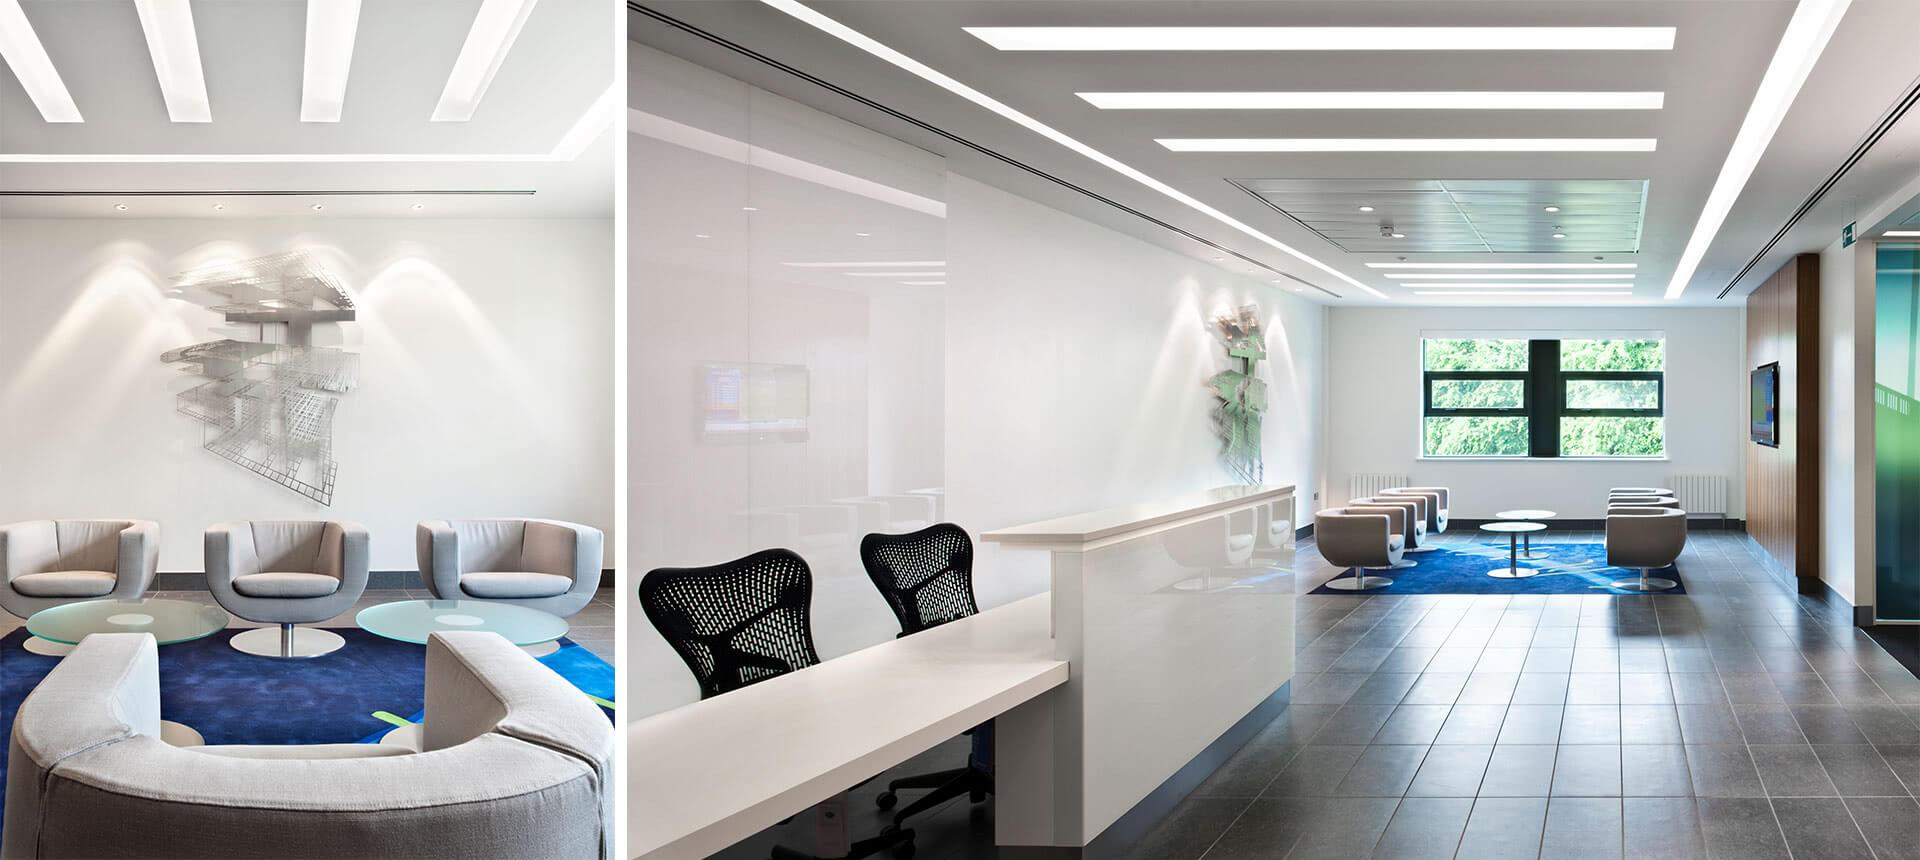 Deloitte Newcastle, UK - CallisonRTKL